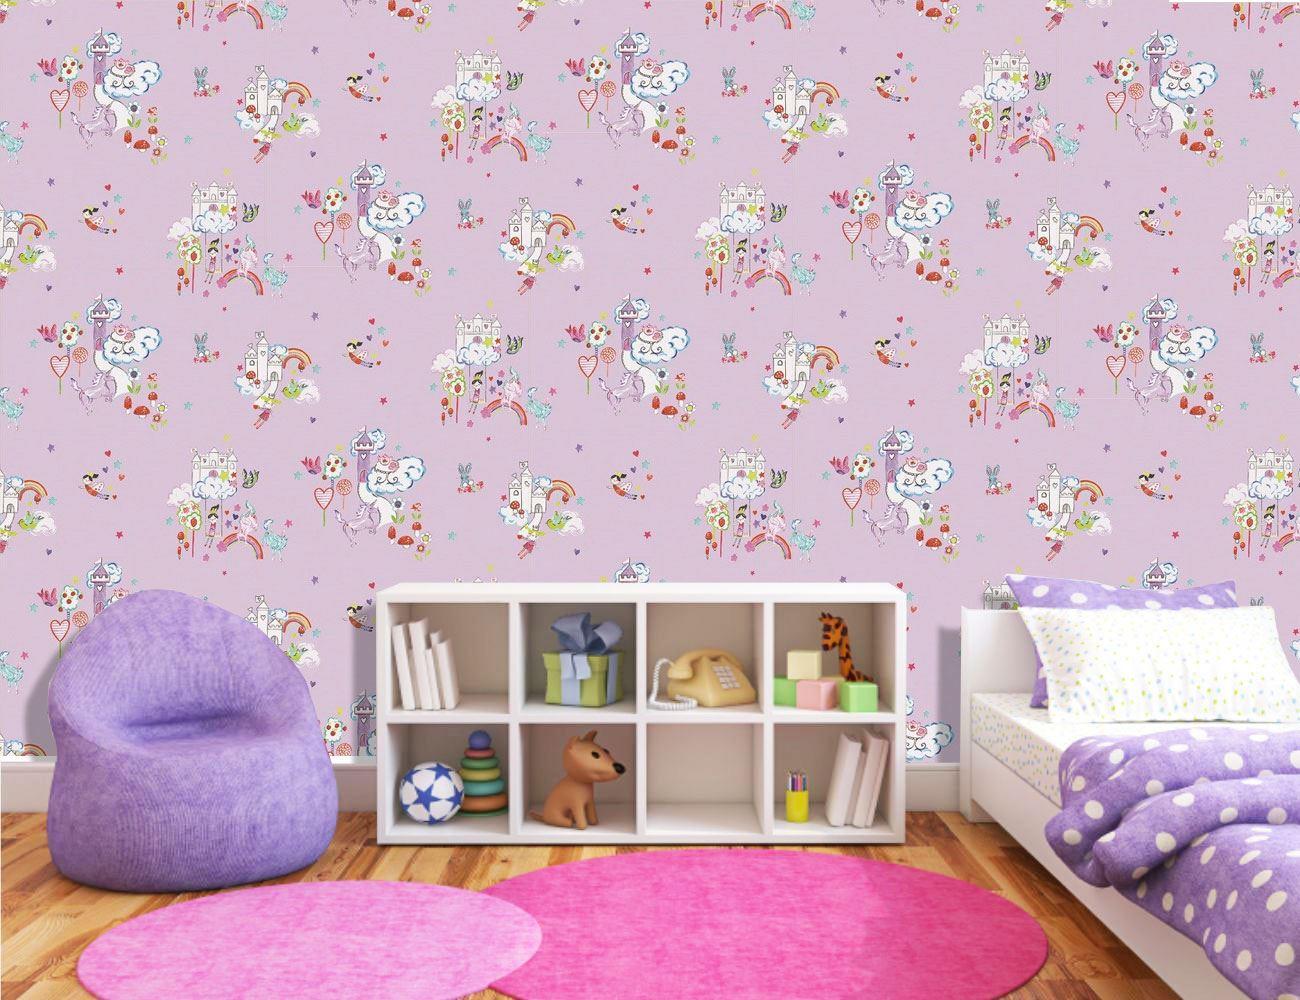 Girls-Unicorn-Wallpaper-Children-039-s-Pink-White-Glitter-Rainbow-Butterflies-Floral thumbnail 13